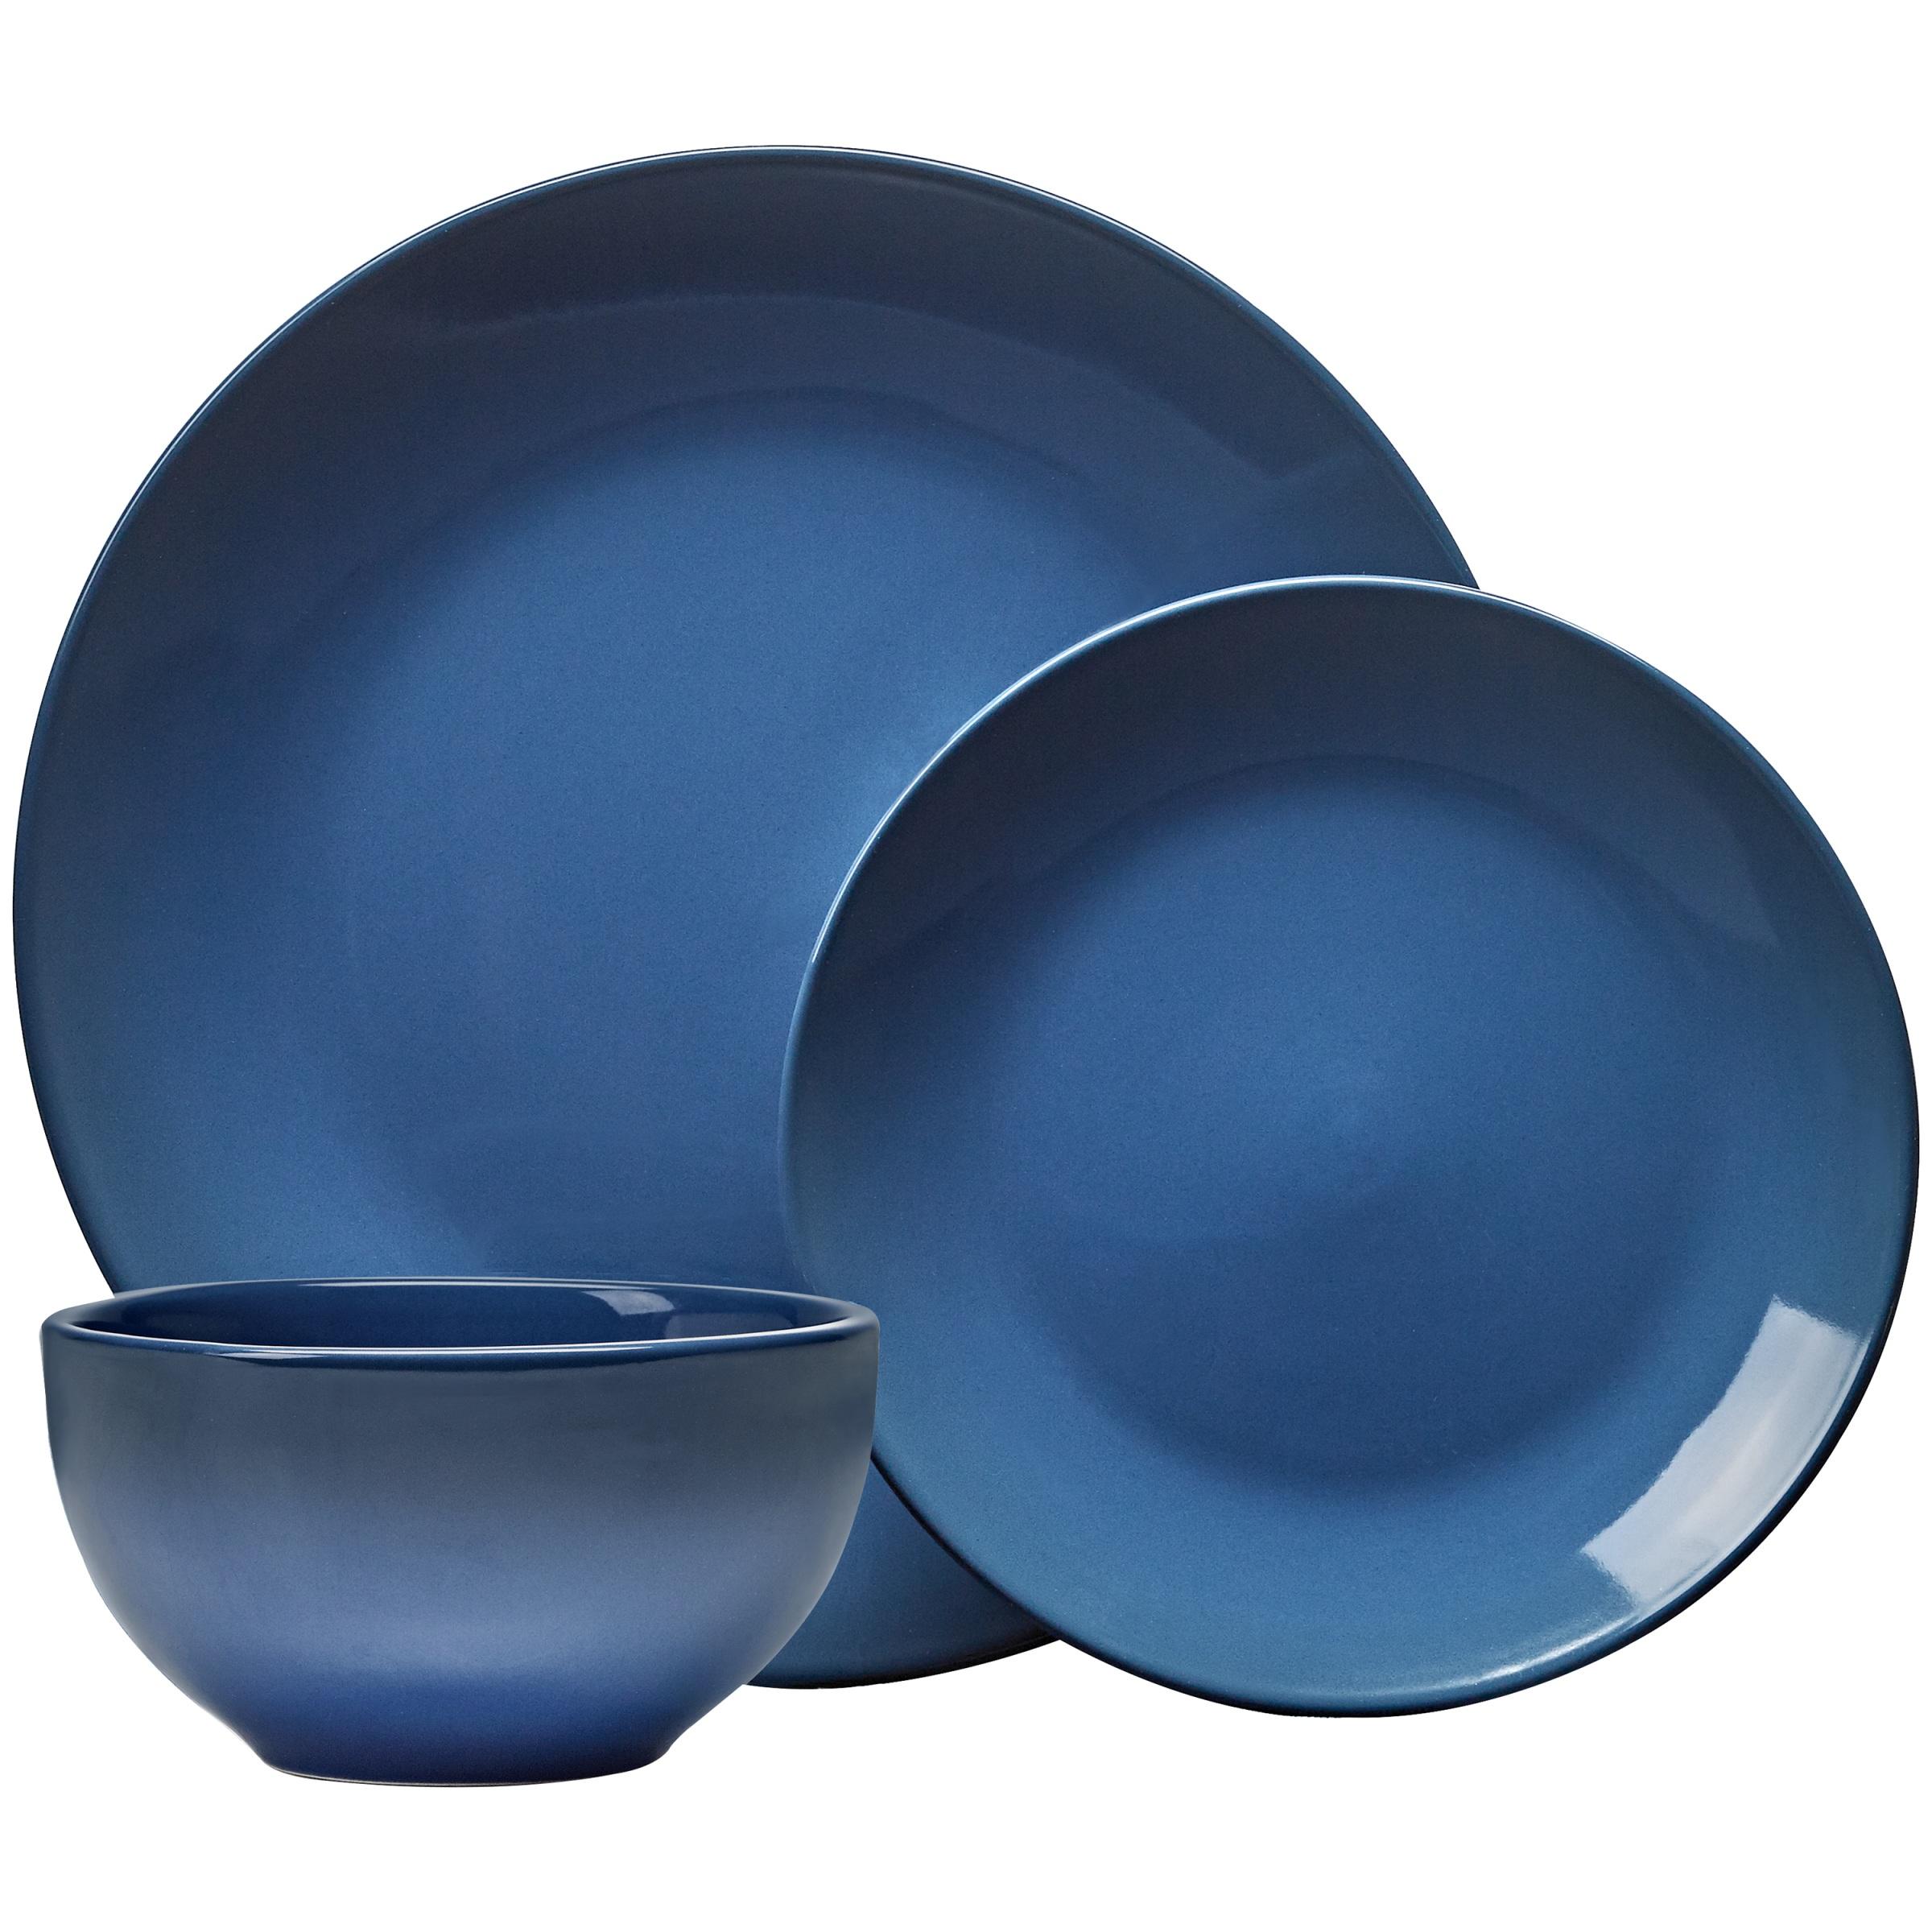 Mainstays Painter's Ombre 12-piece Lapis Blue Stoneware Dinnerware Set, Walmart Exclusive